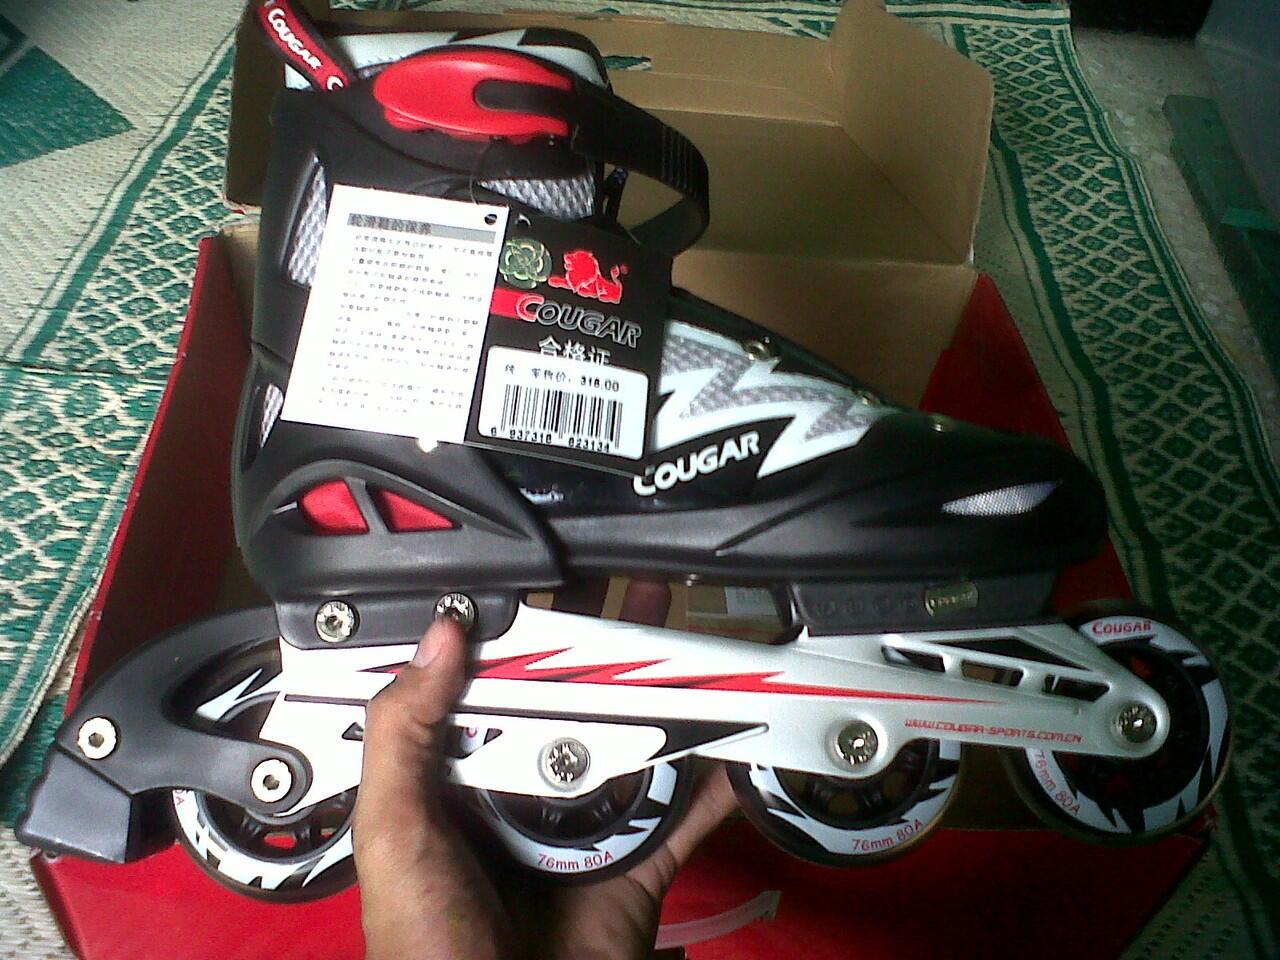 Terjual Sepatu Roda Roller Blade In Line Skate Cougar Kaskus 4c5dd63633